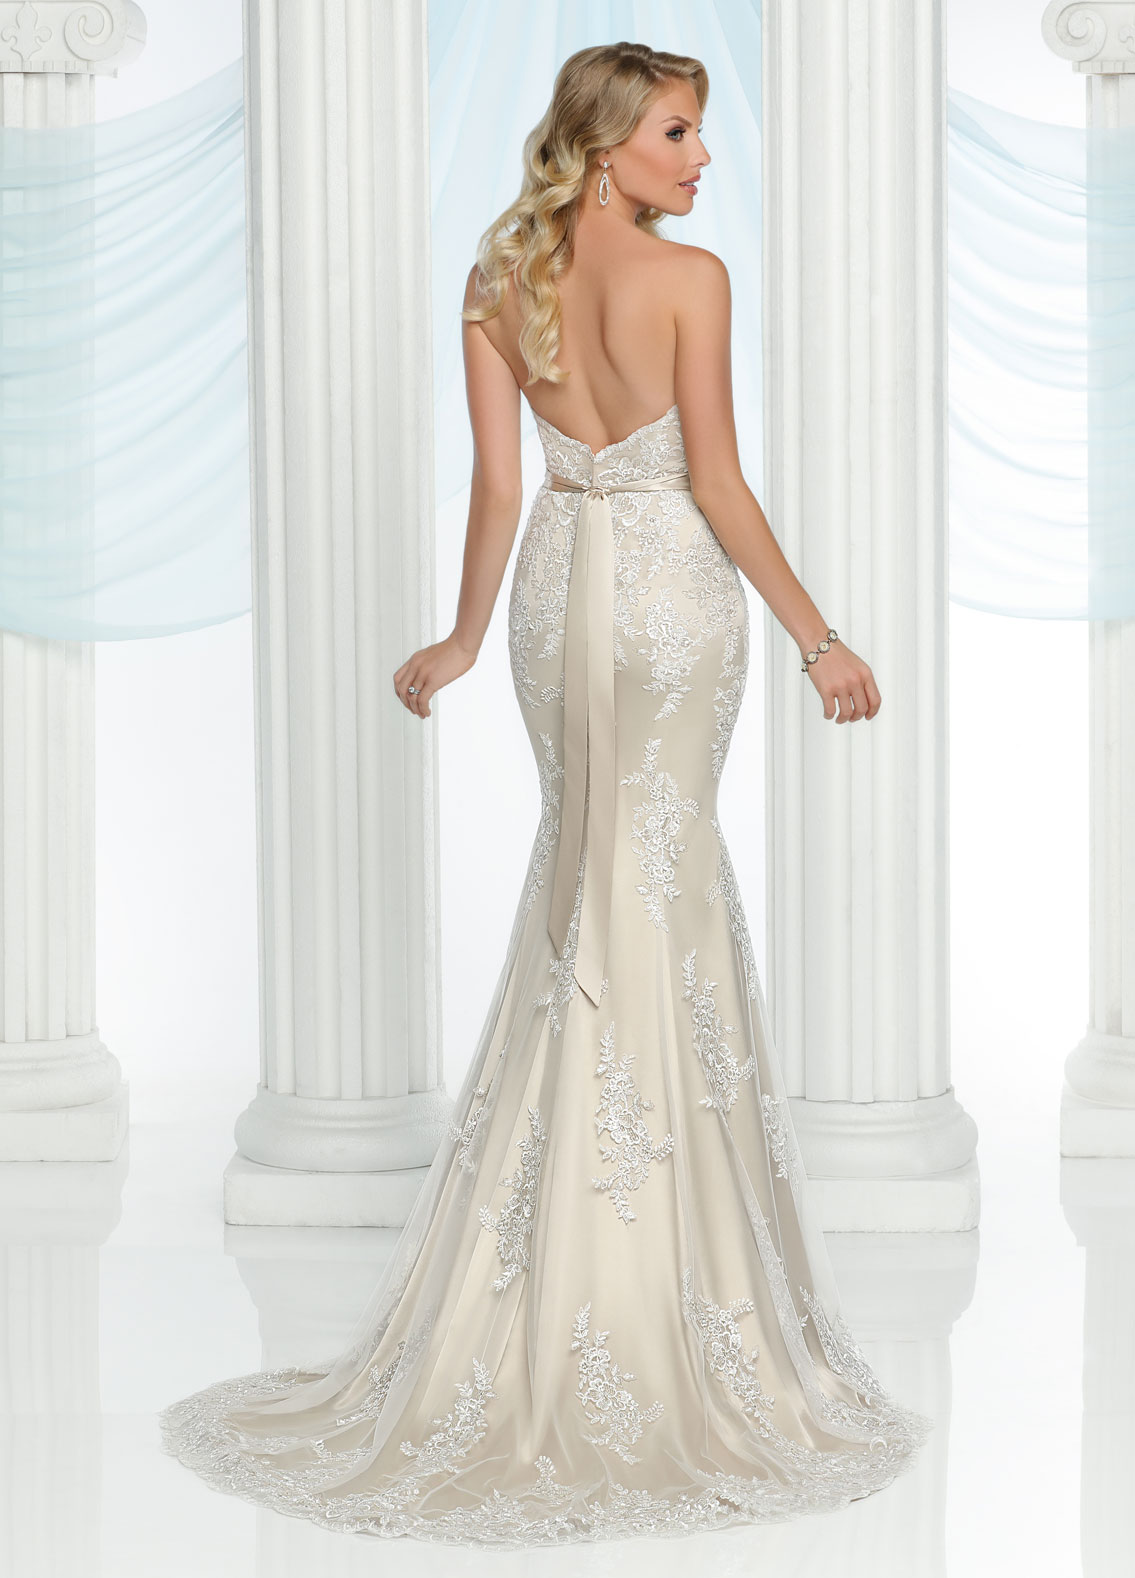 Sheath Form Fitting Lace Wedding Dresses Davinci Bridal Blog,Lace Black Women Wedding Dresses